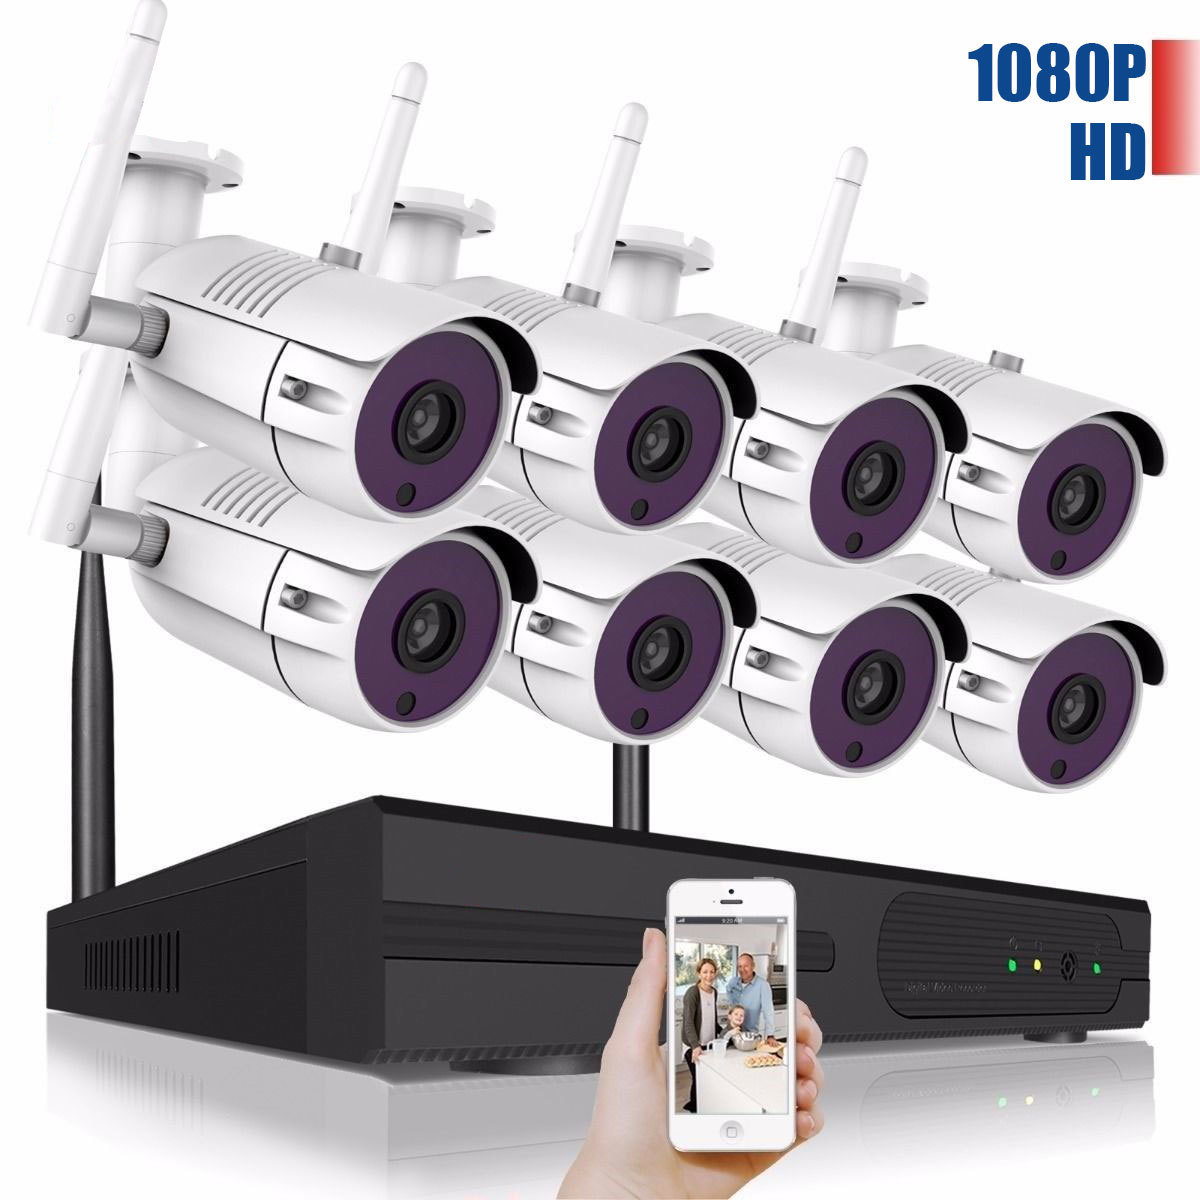 Full HD 1080P 8CH Wireless NVR CCTV Security System 2 0MP IP Camera 1080P Wifi